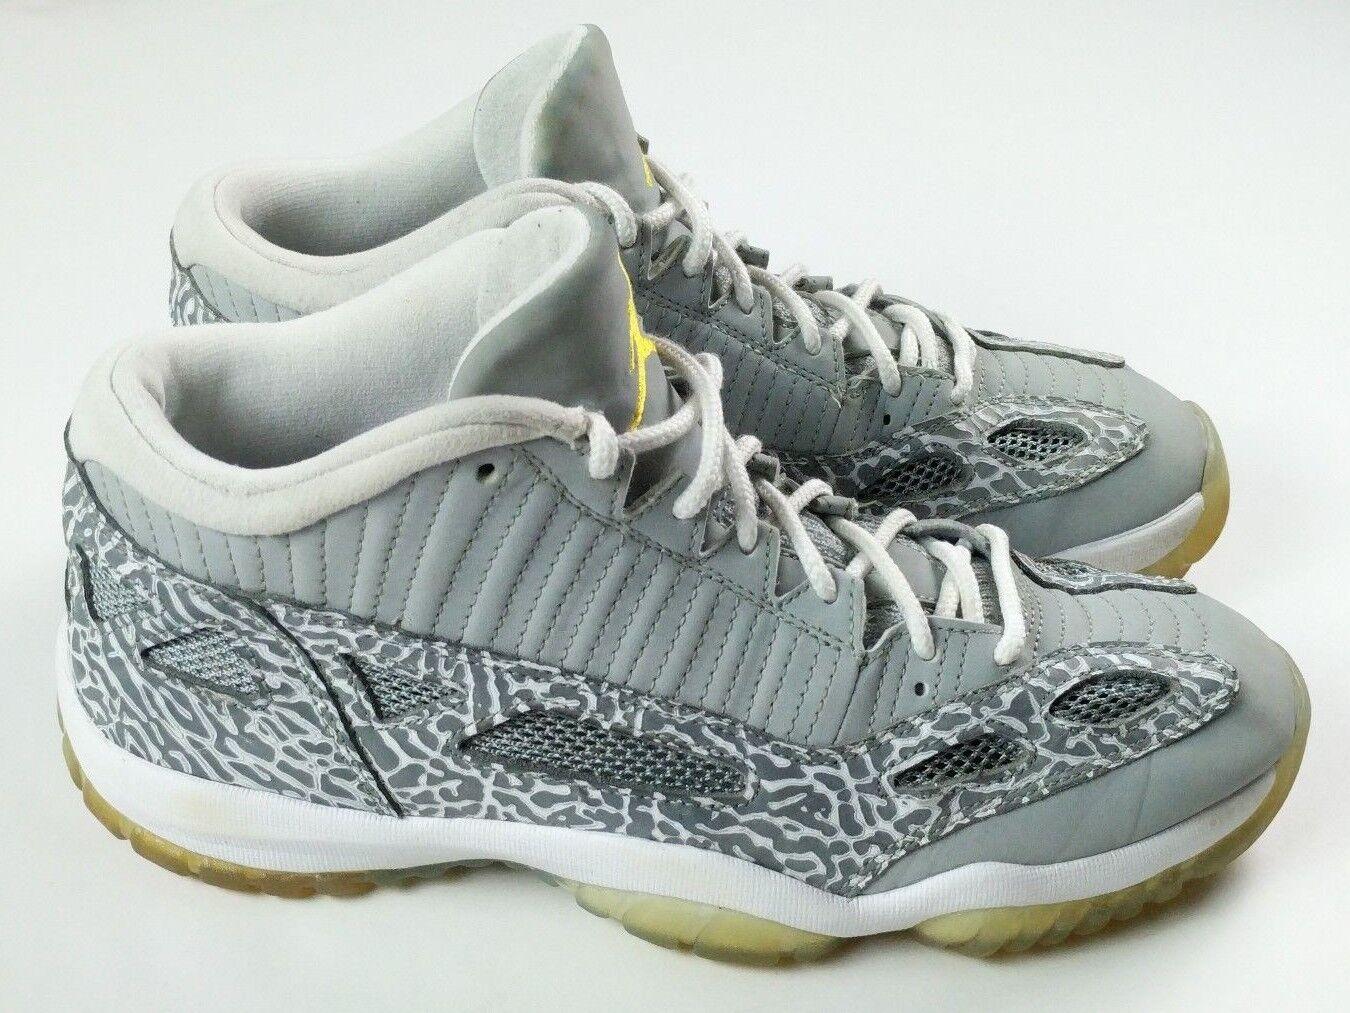 Nike air jordan 11 xi retro - tief bei ie ie ie schuhe in größe 10 silber lebensfreude 306008 072 d7bc92